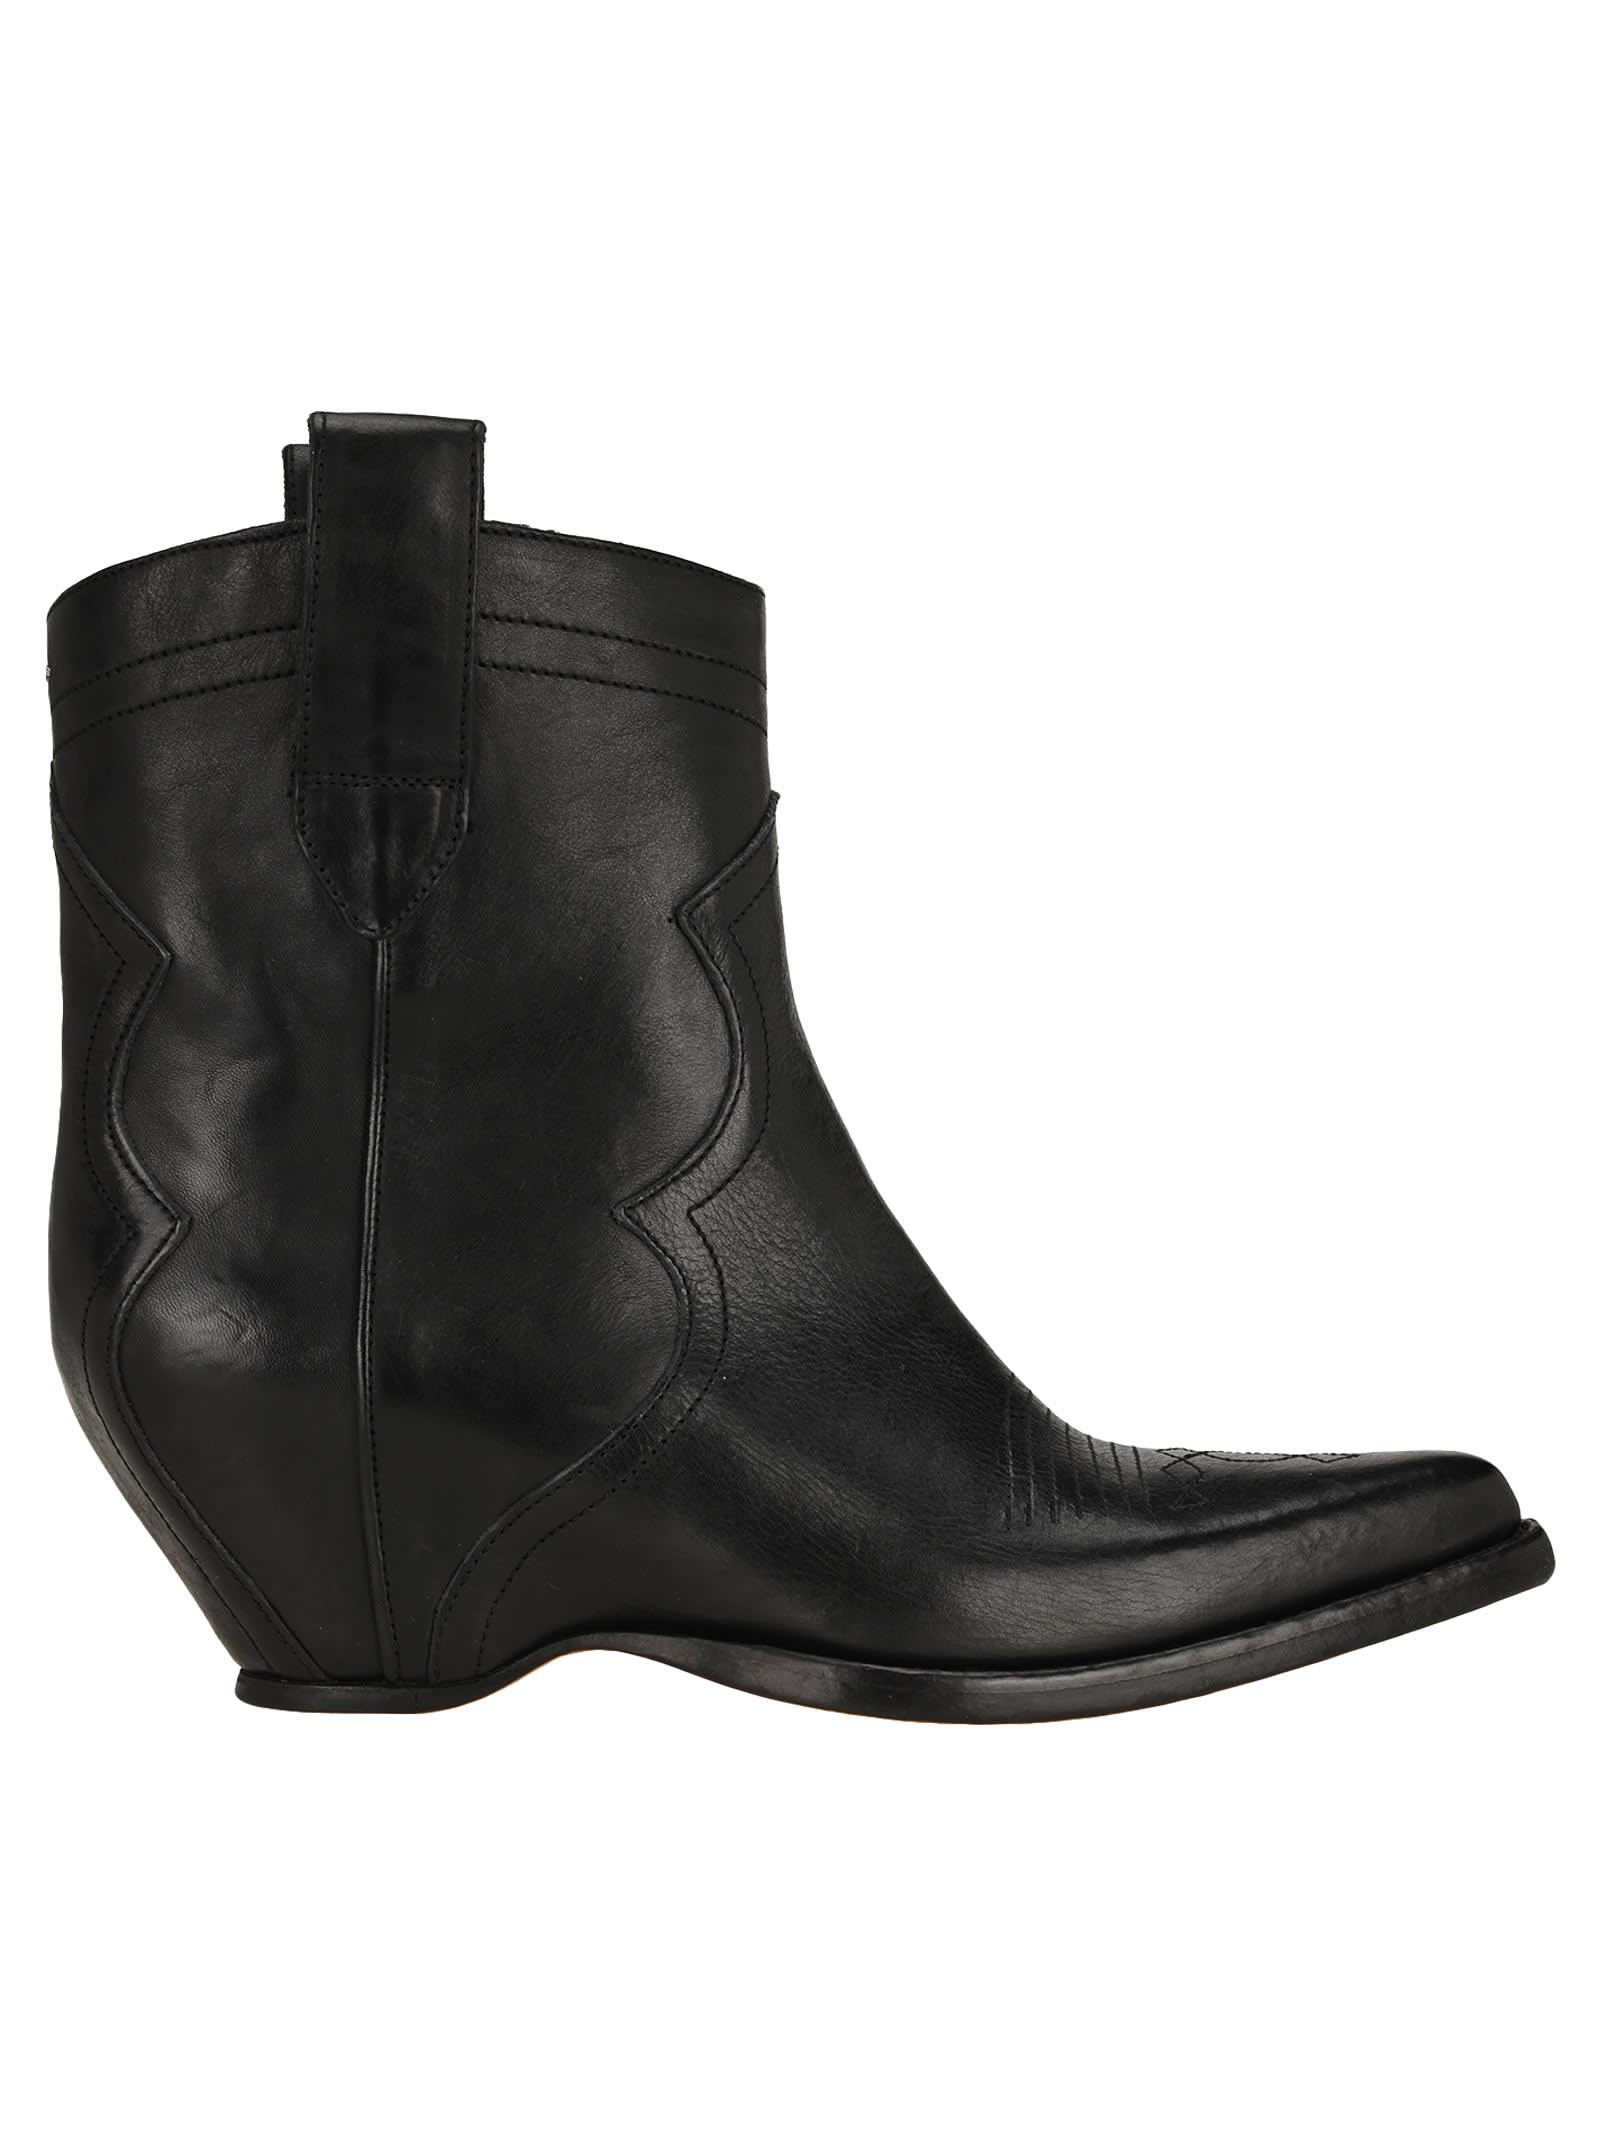 Martin Margiela Sendra Boots